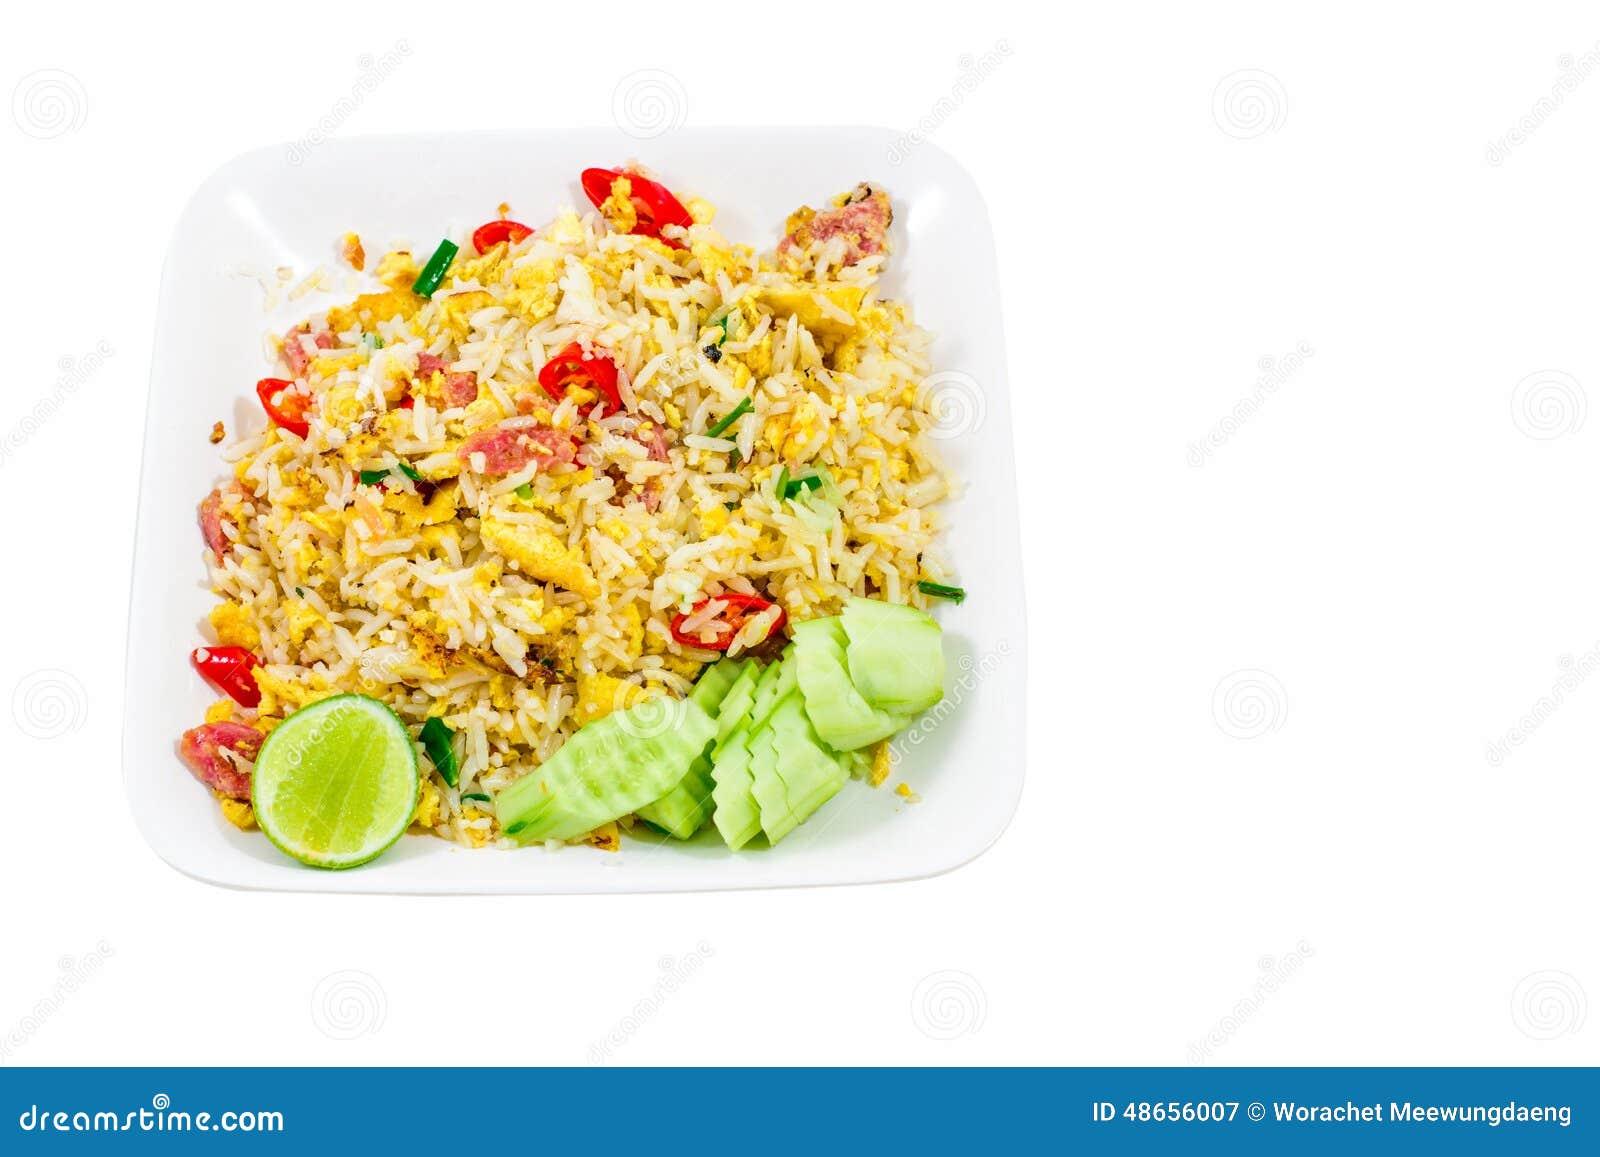 Whit Таиланд жареных рисов